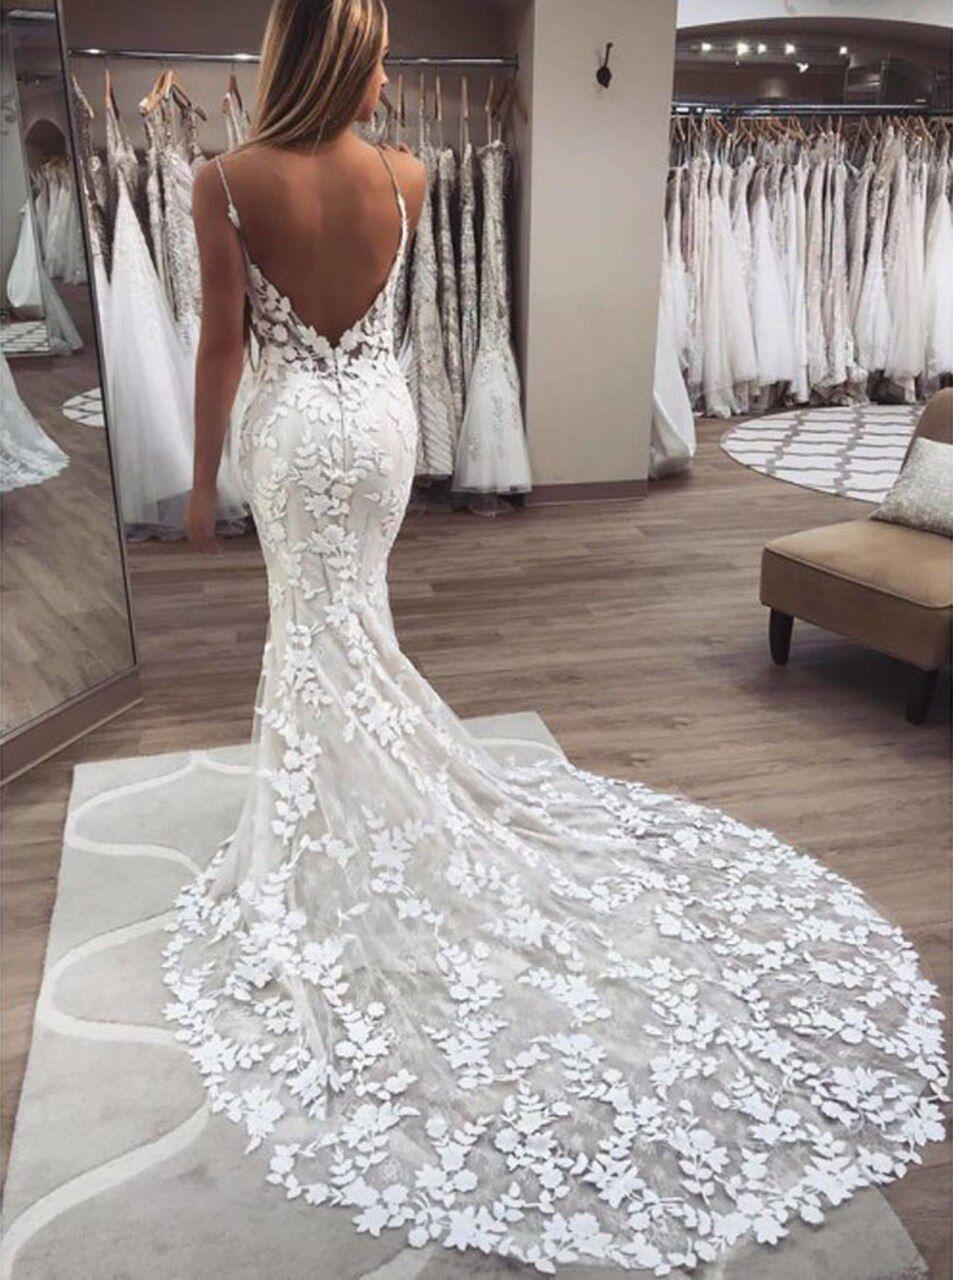 Lace Mermaid Wedding Dress With Spaghetti Straps Destination Wedding Dress 12137 Boho Bridal Gowns Wedding Dresses Backless Wedding [ 1280 x 953 Pixel ]